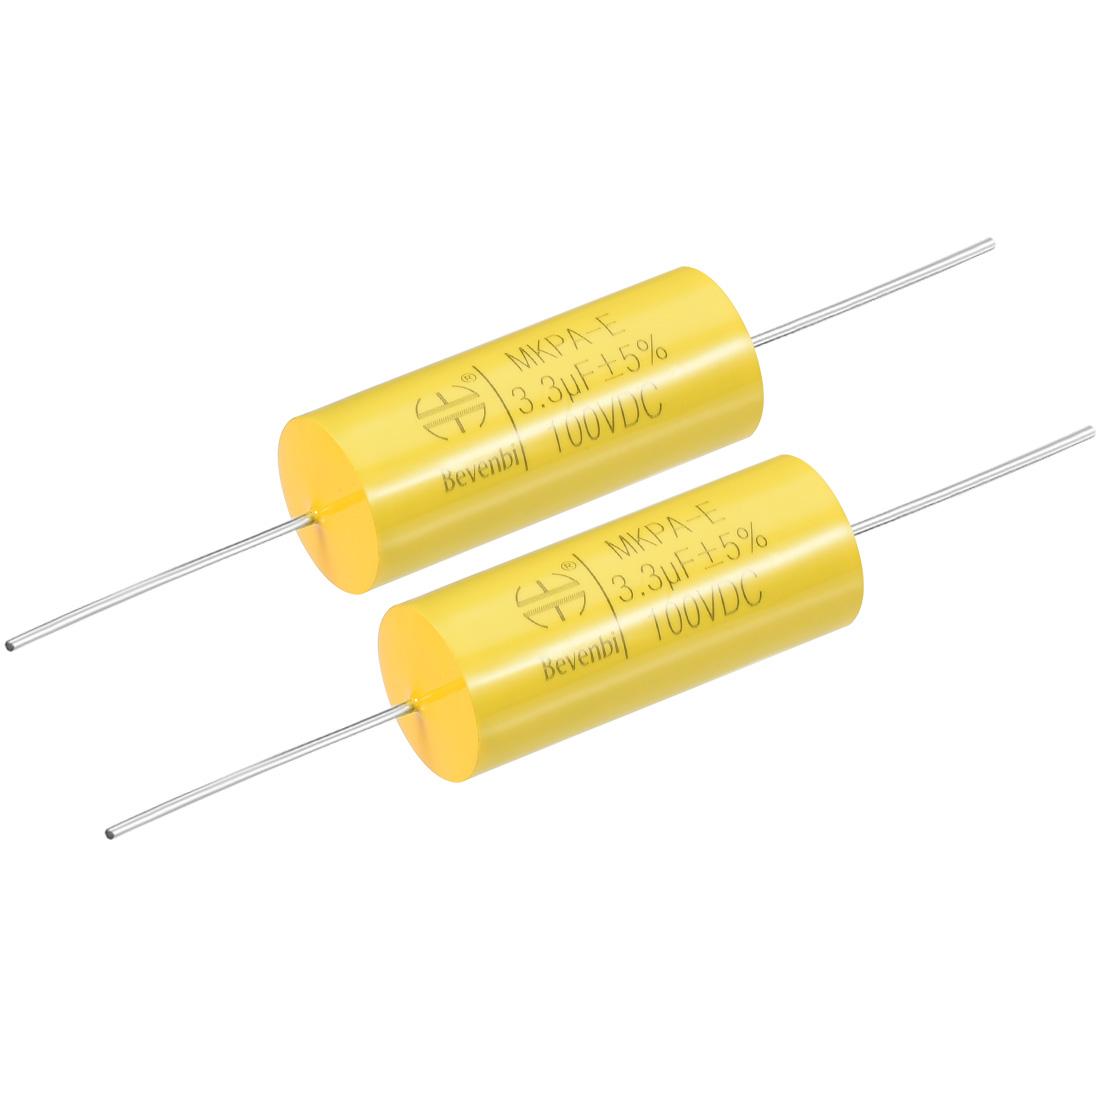 Film Capacitor 100V DC 3.3uF MKPA-E Round Polypropylene Capacitors Yellow 2pcs